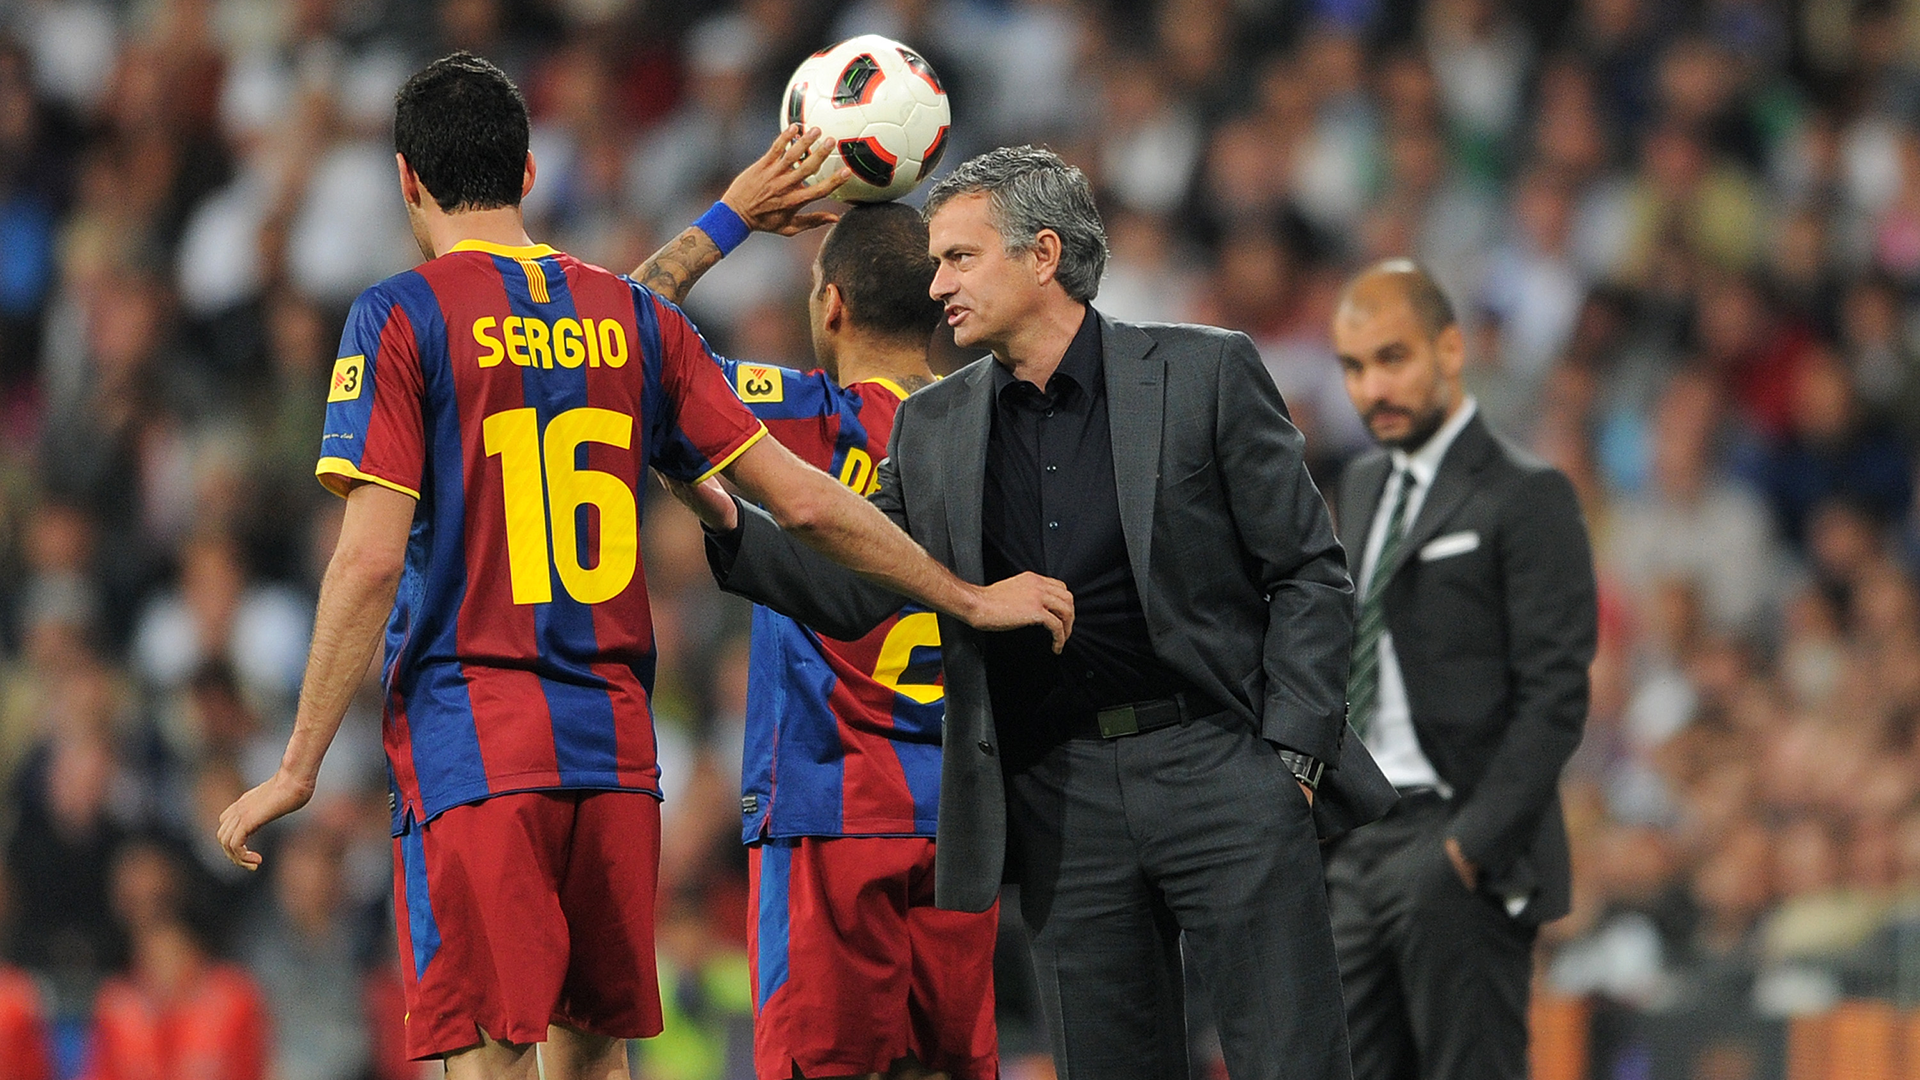 Jose Mourinho Real Madrid 2011